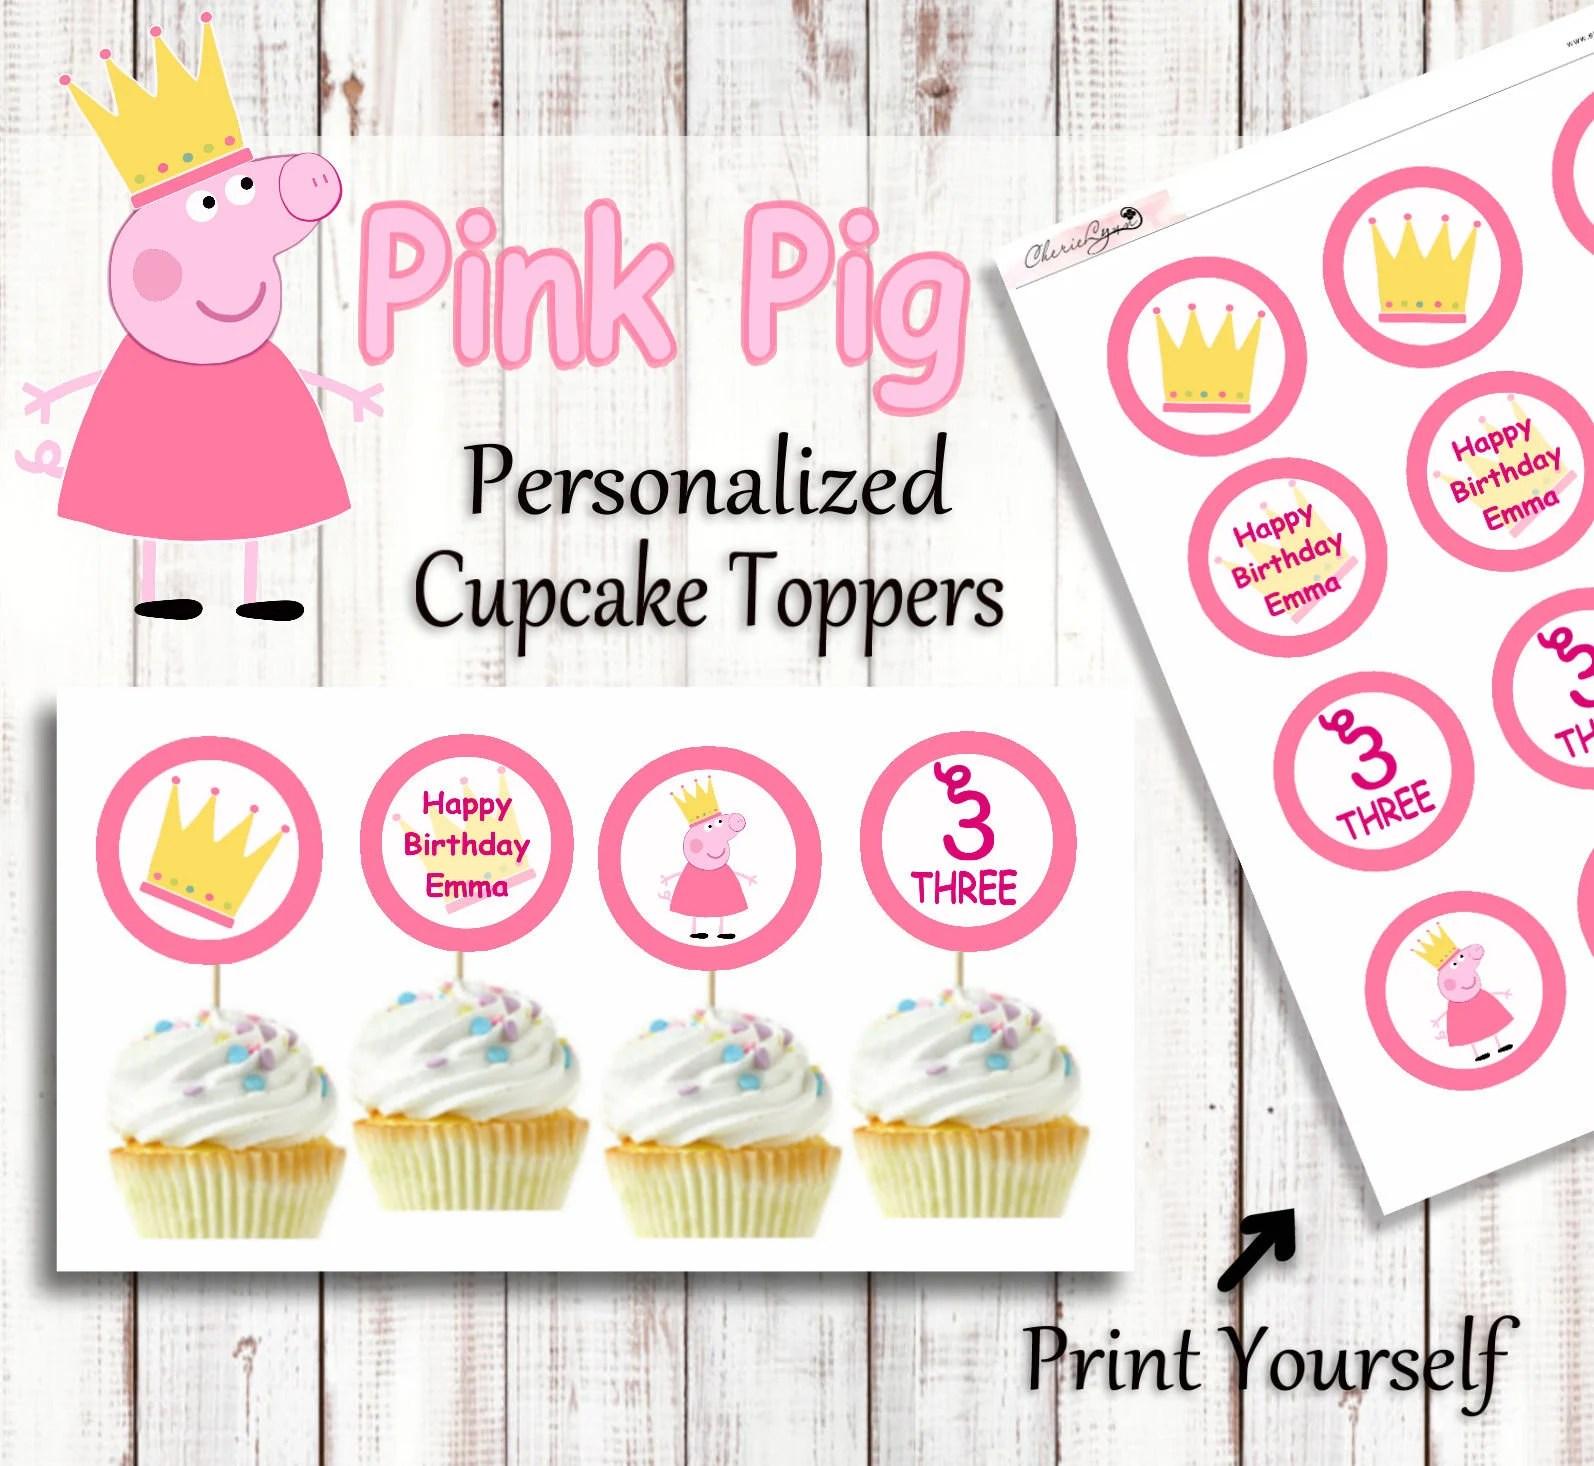 Peppa Pig Birthday Peppa Pig Peppa Pig Cupcake Toppers Peppa Pig Cupcakes Peppa Pig Party Decor Peppa Pig Printables Birthday Party